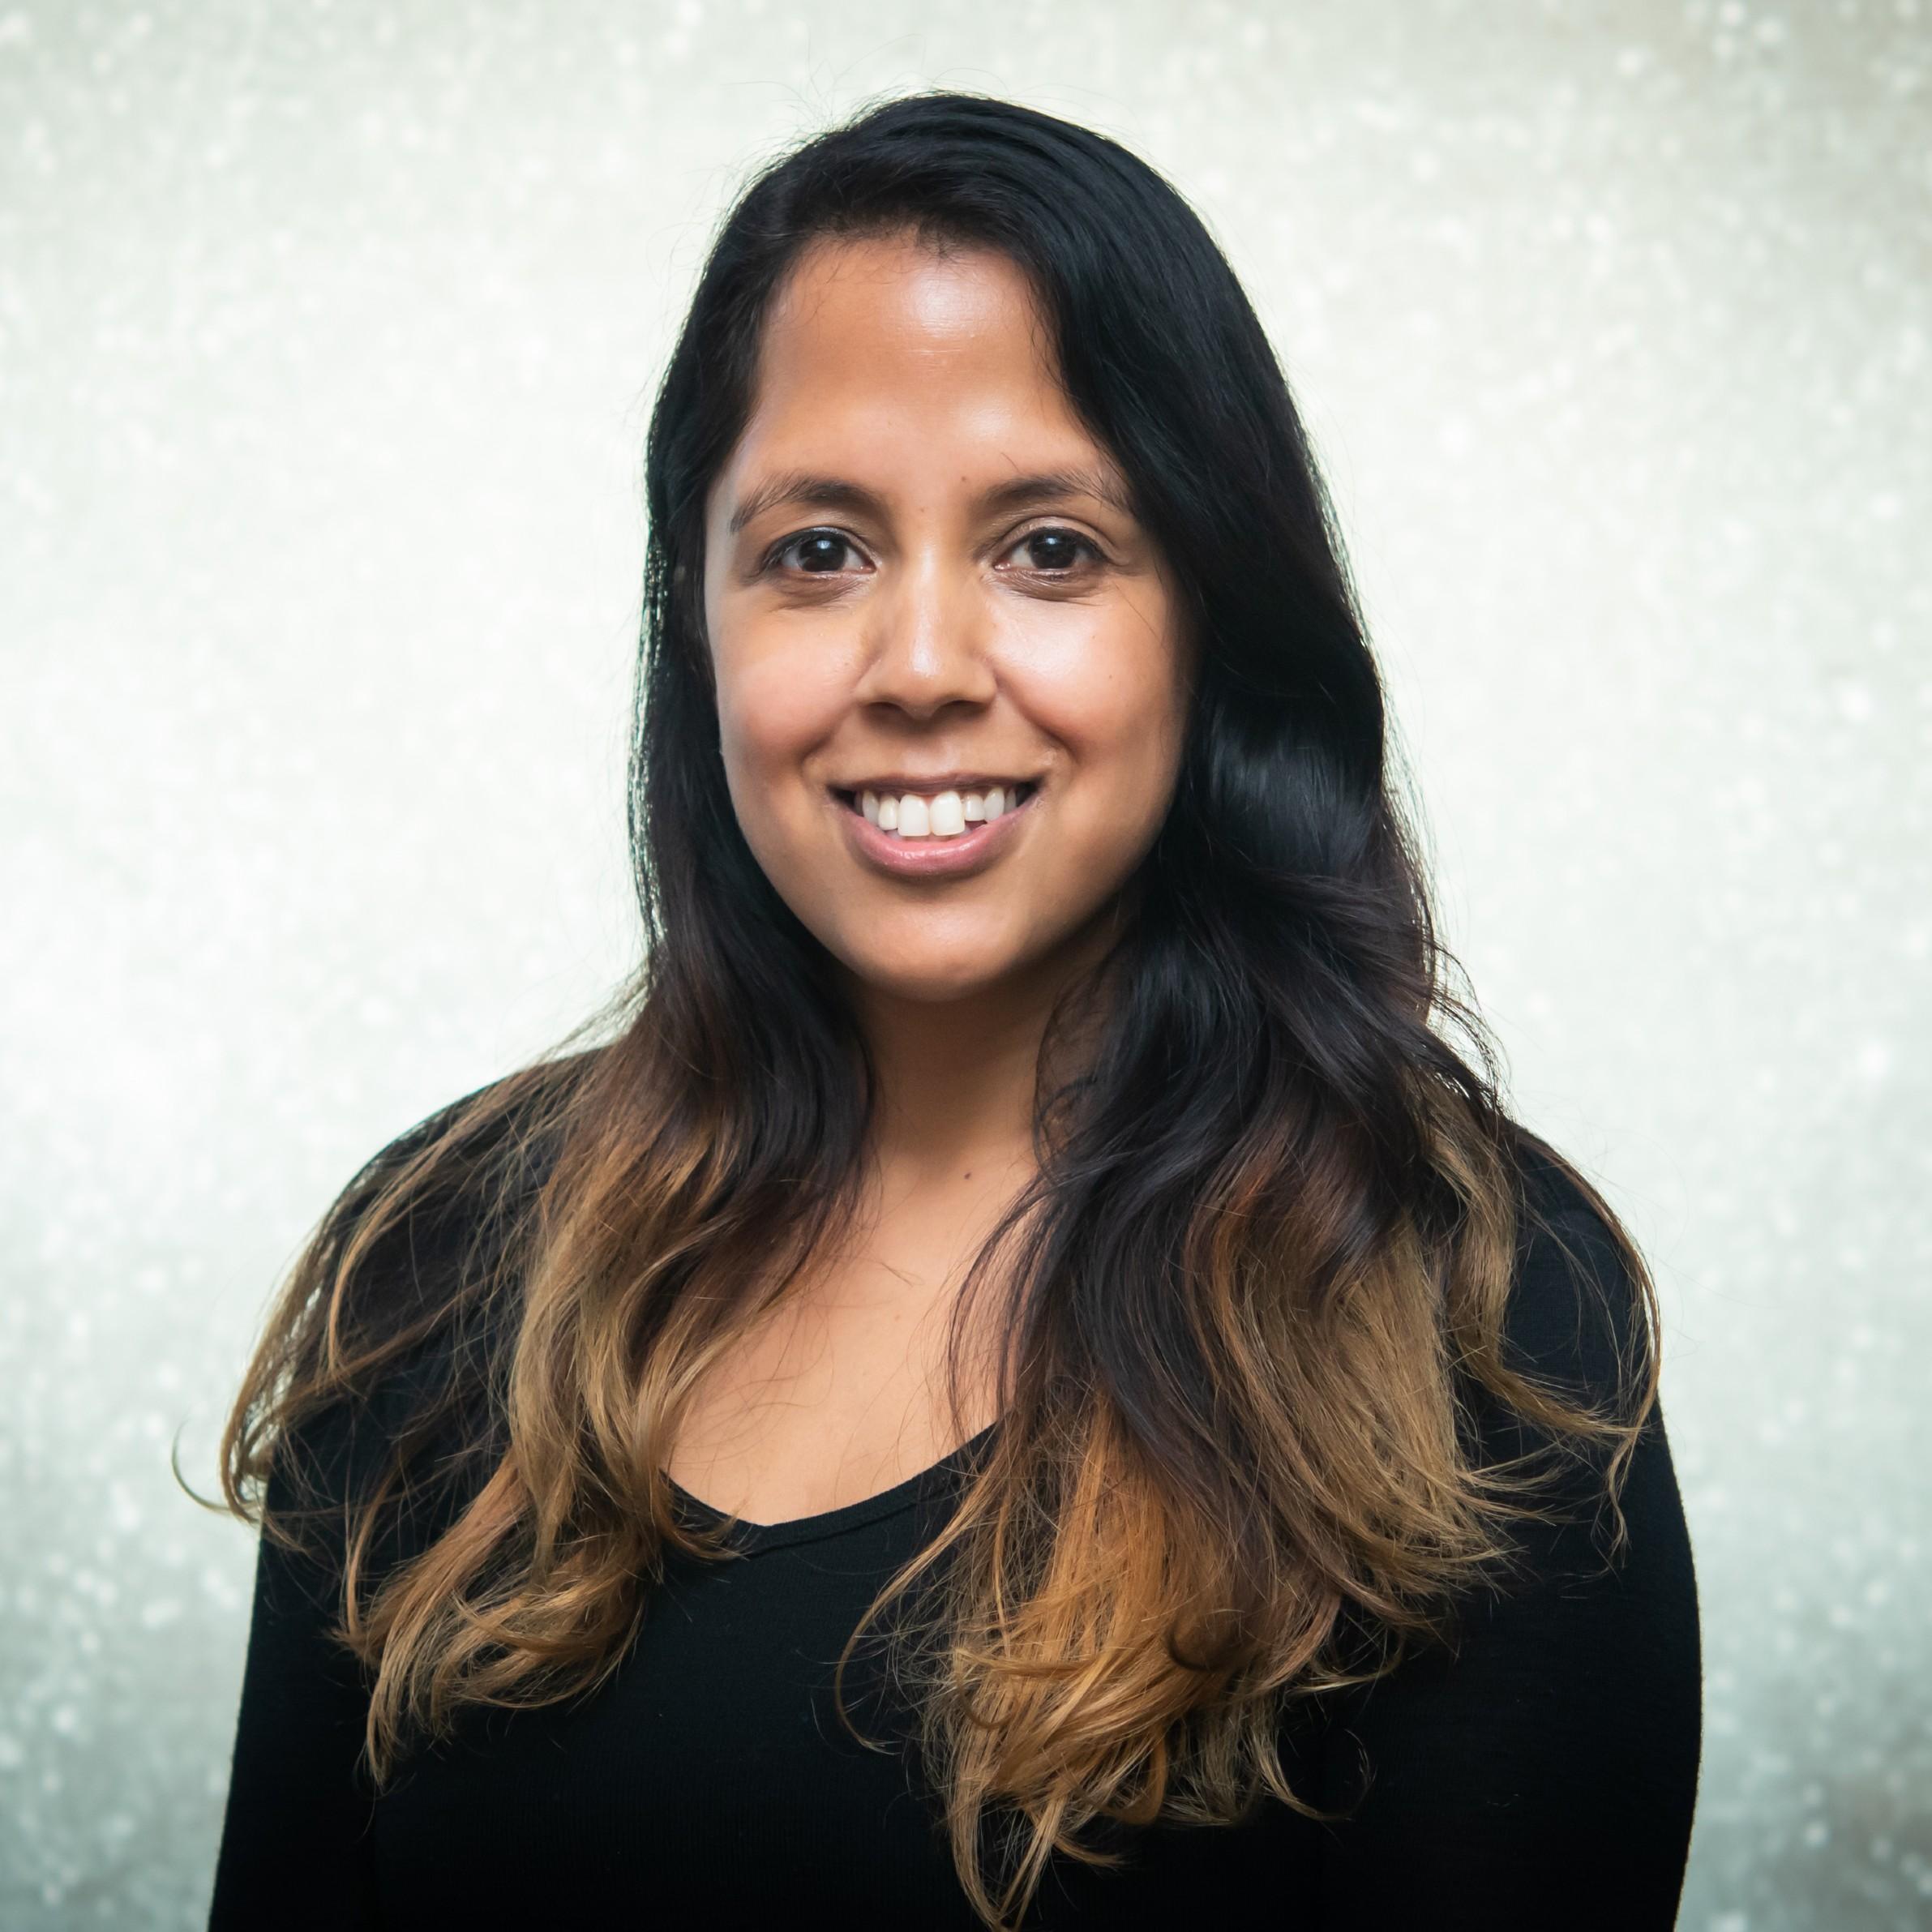 Anita Ravji profile picture photograph